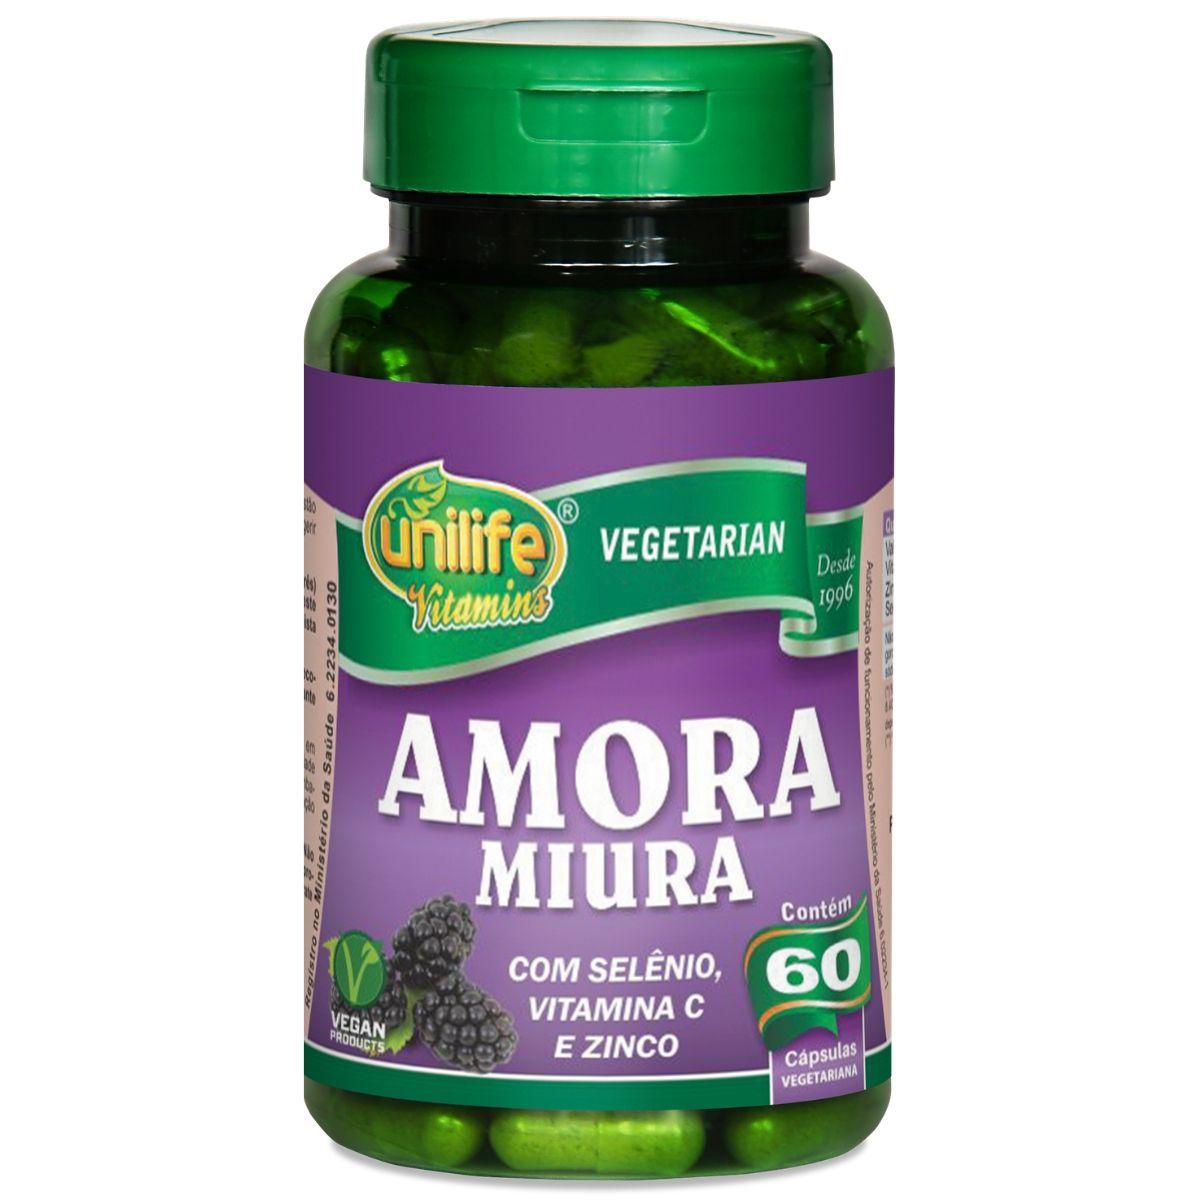 Amora Miura Com Vitaminas 60 Capsulas 500mg - Unilife